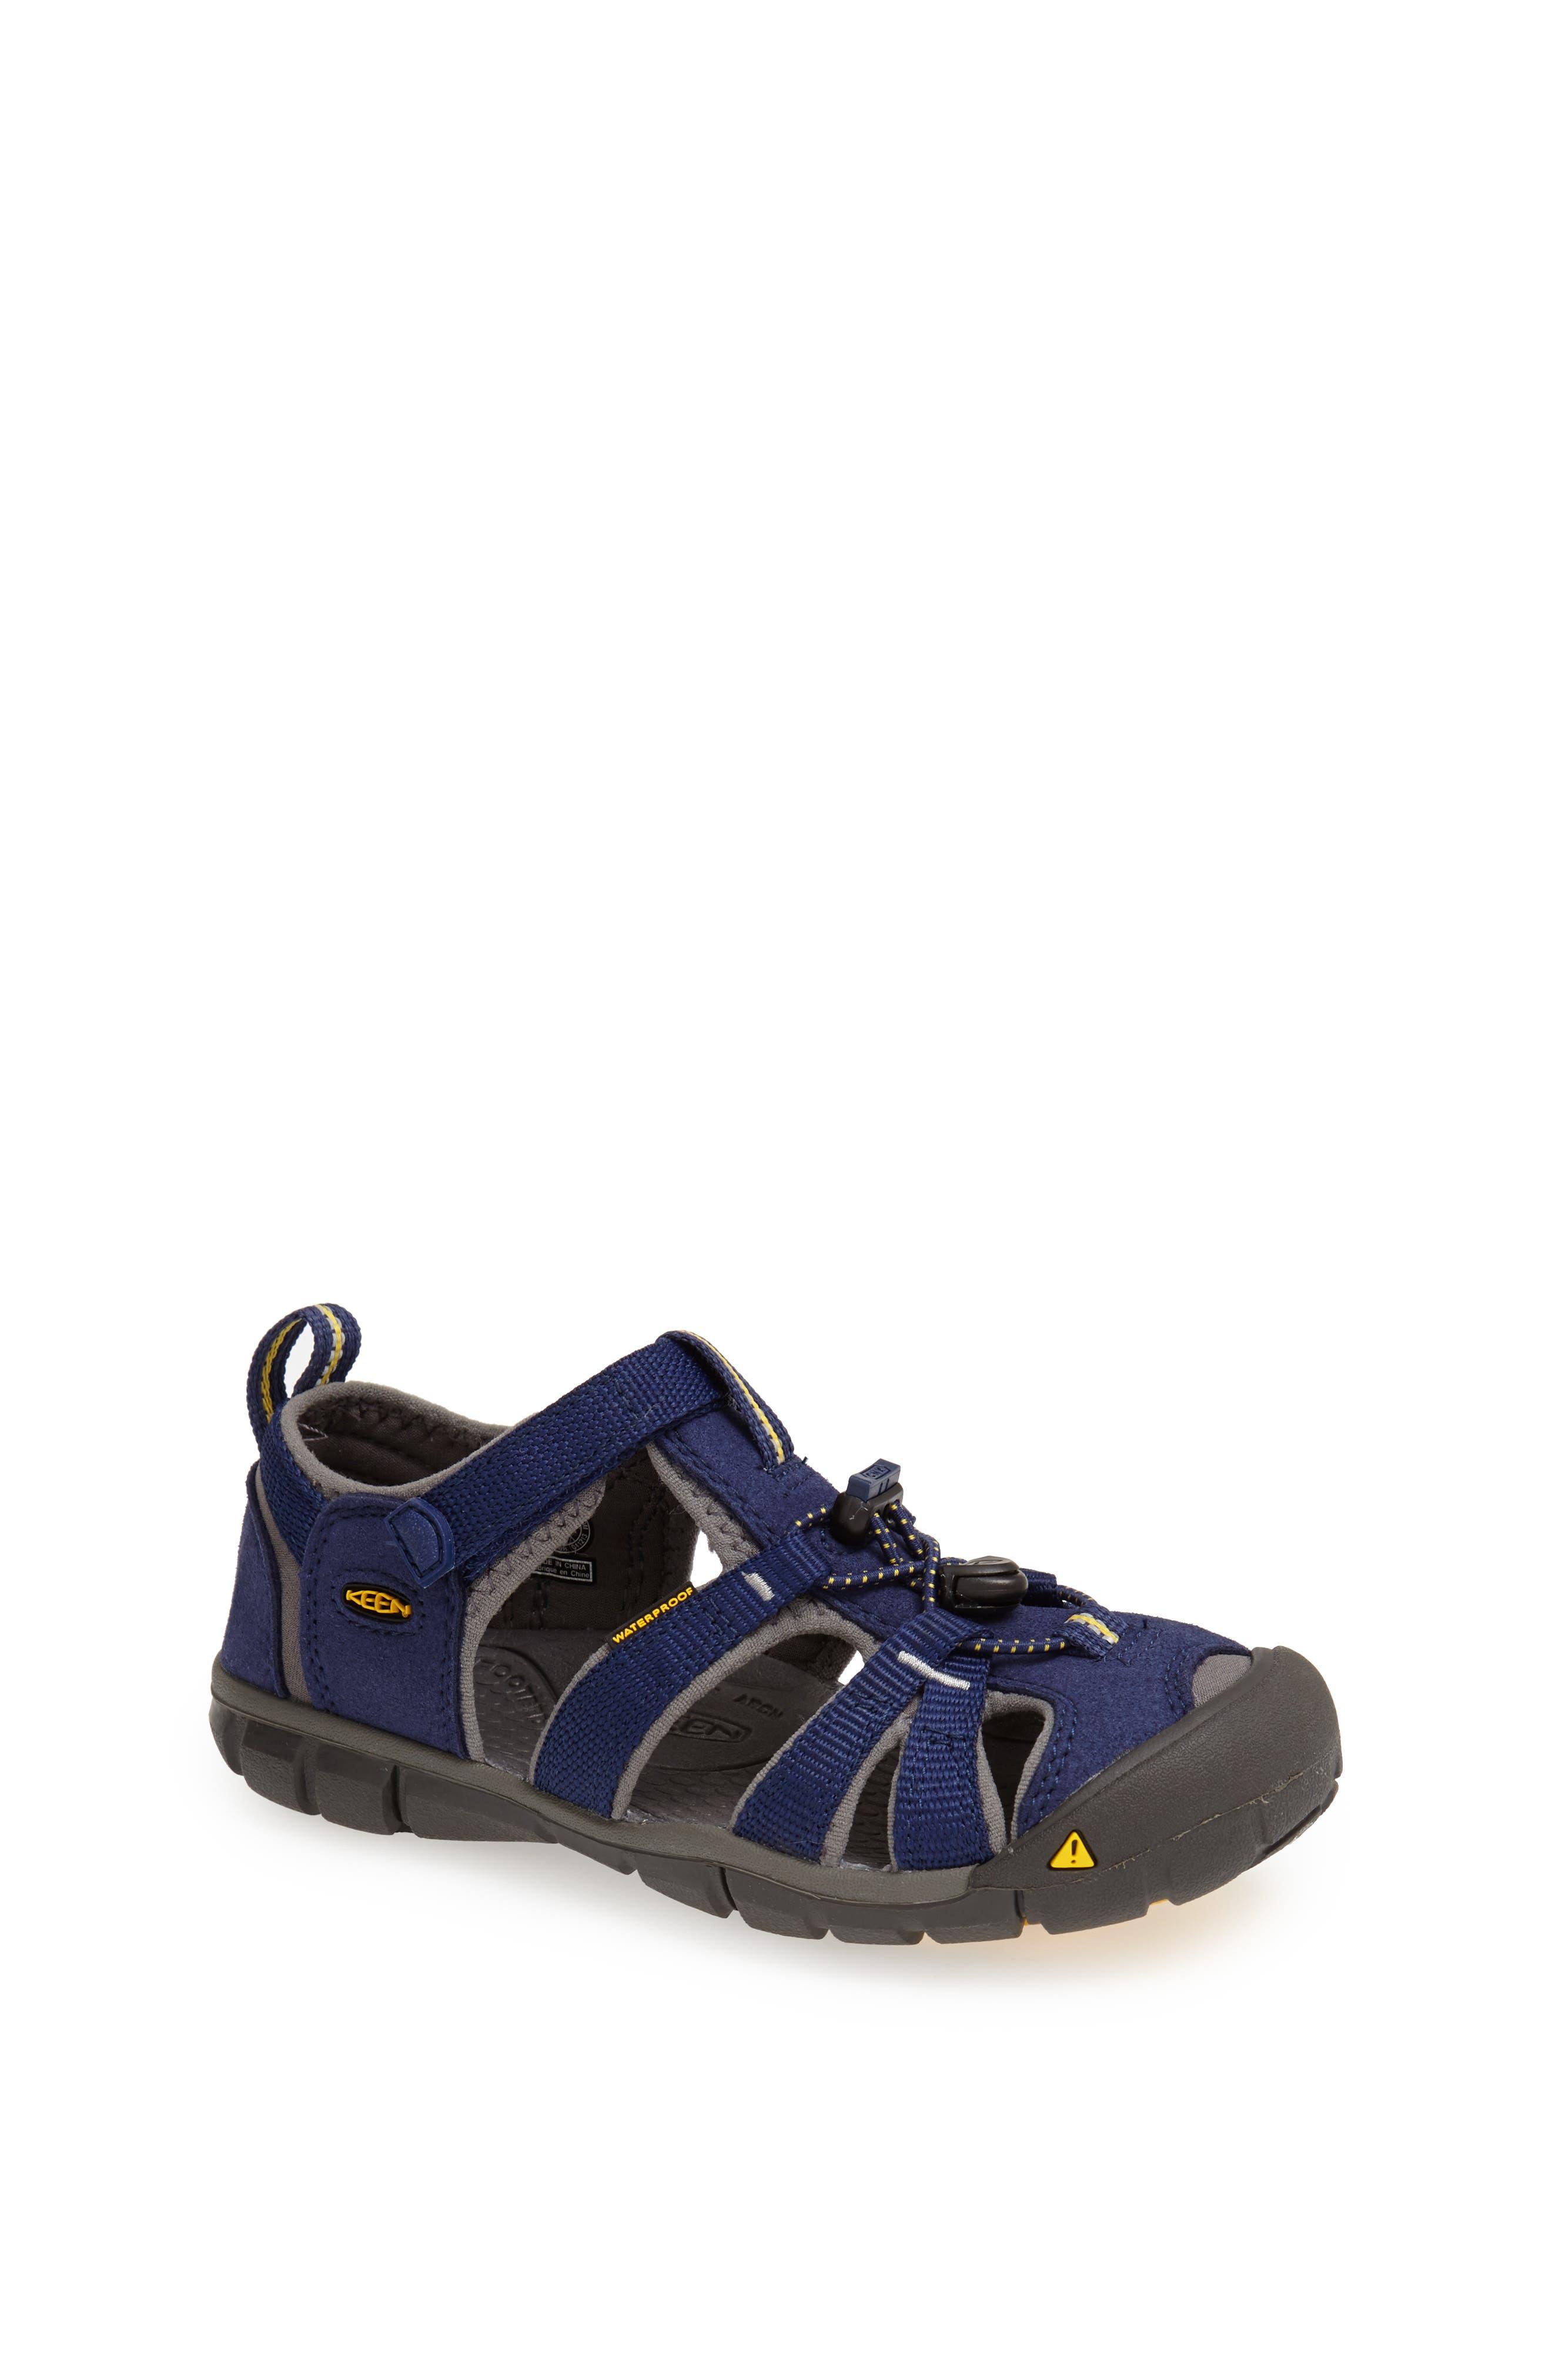 ,                             'Seacamp II' Water Friendly Sandal,                             Alternate thumbnail 208, color,                             477